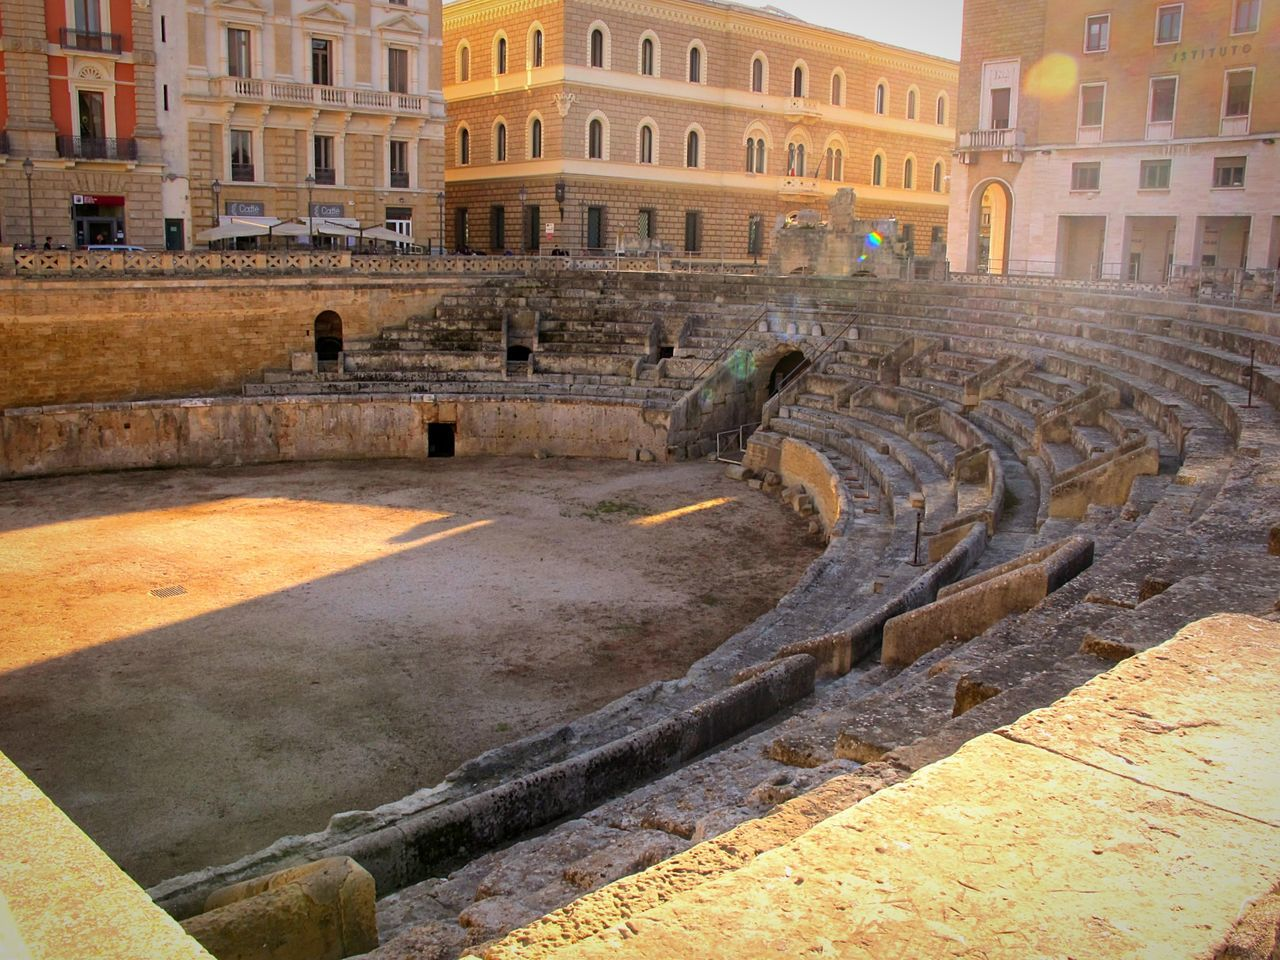 Enjoying Life Puglia Puglia South Italy Puglia2016 Taking Photos Italy Holidays Italy Monument Monuments Monument Valley Monumental  Monumental Buildings History Historical Historical Building Historical Monuments